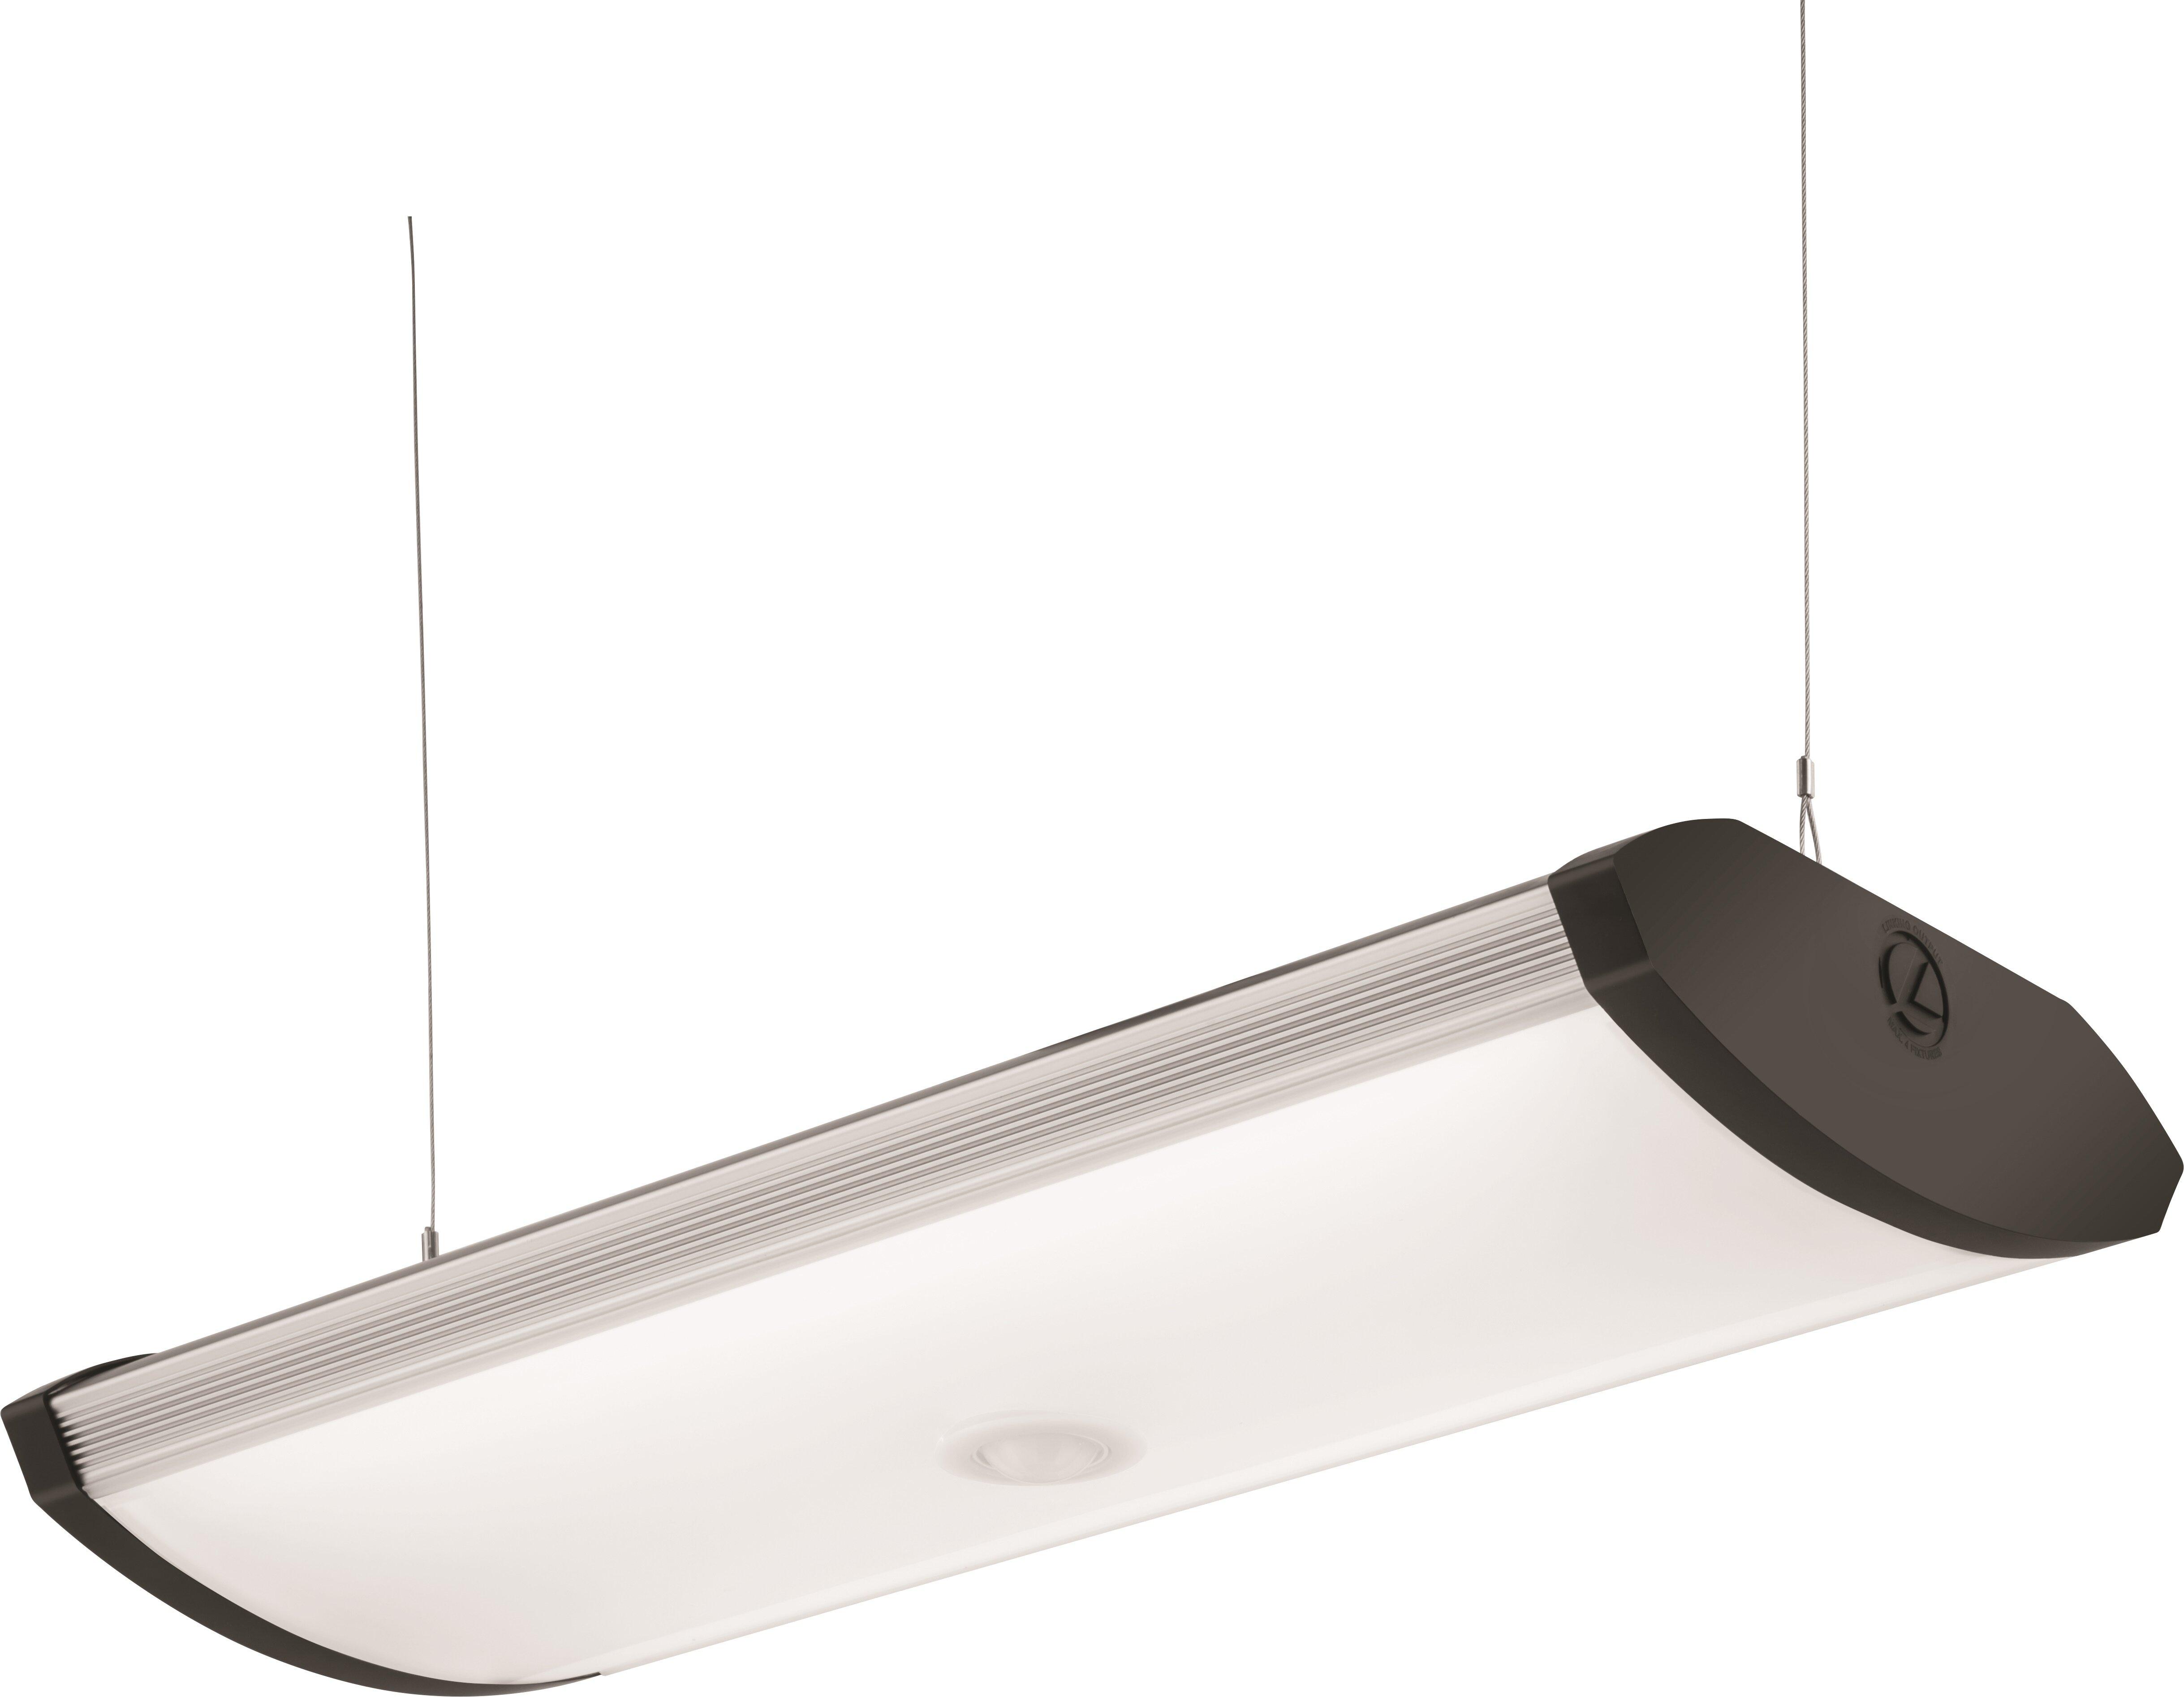 Lithonia Lighting 2 Led Shop Light Wayfair